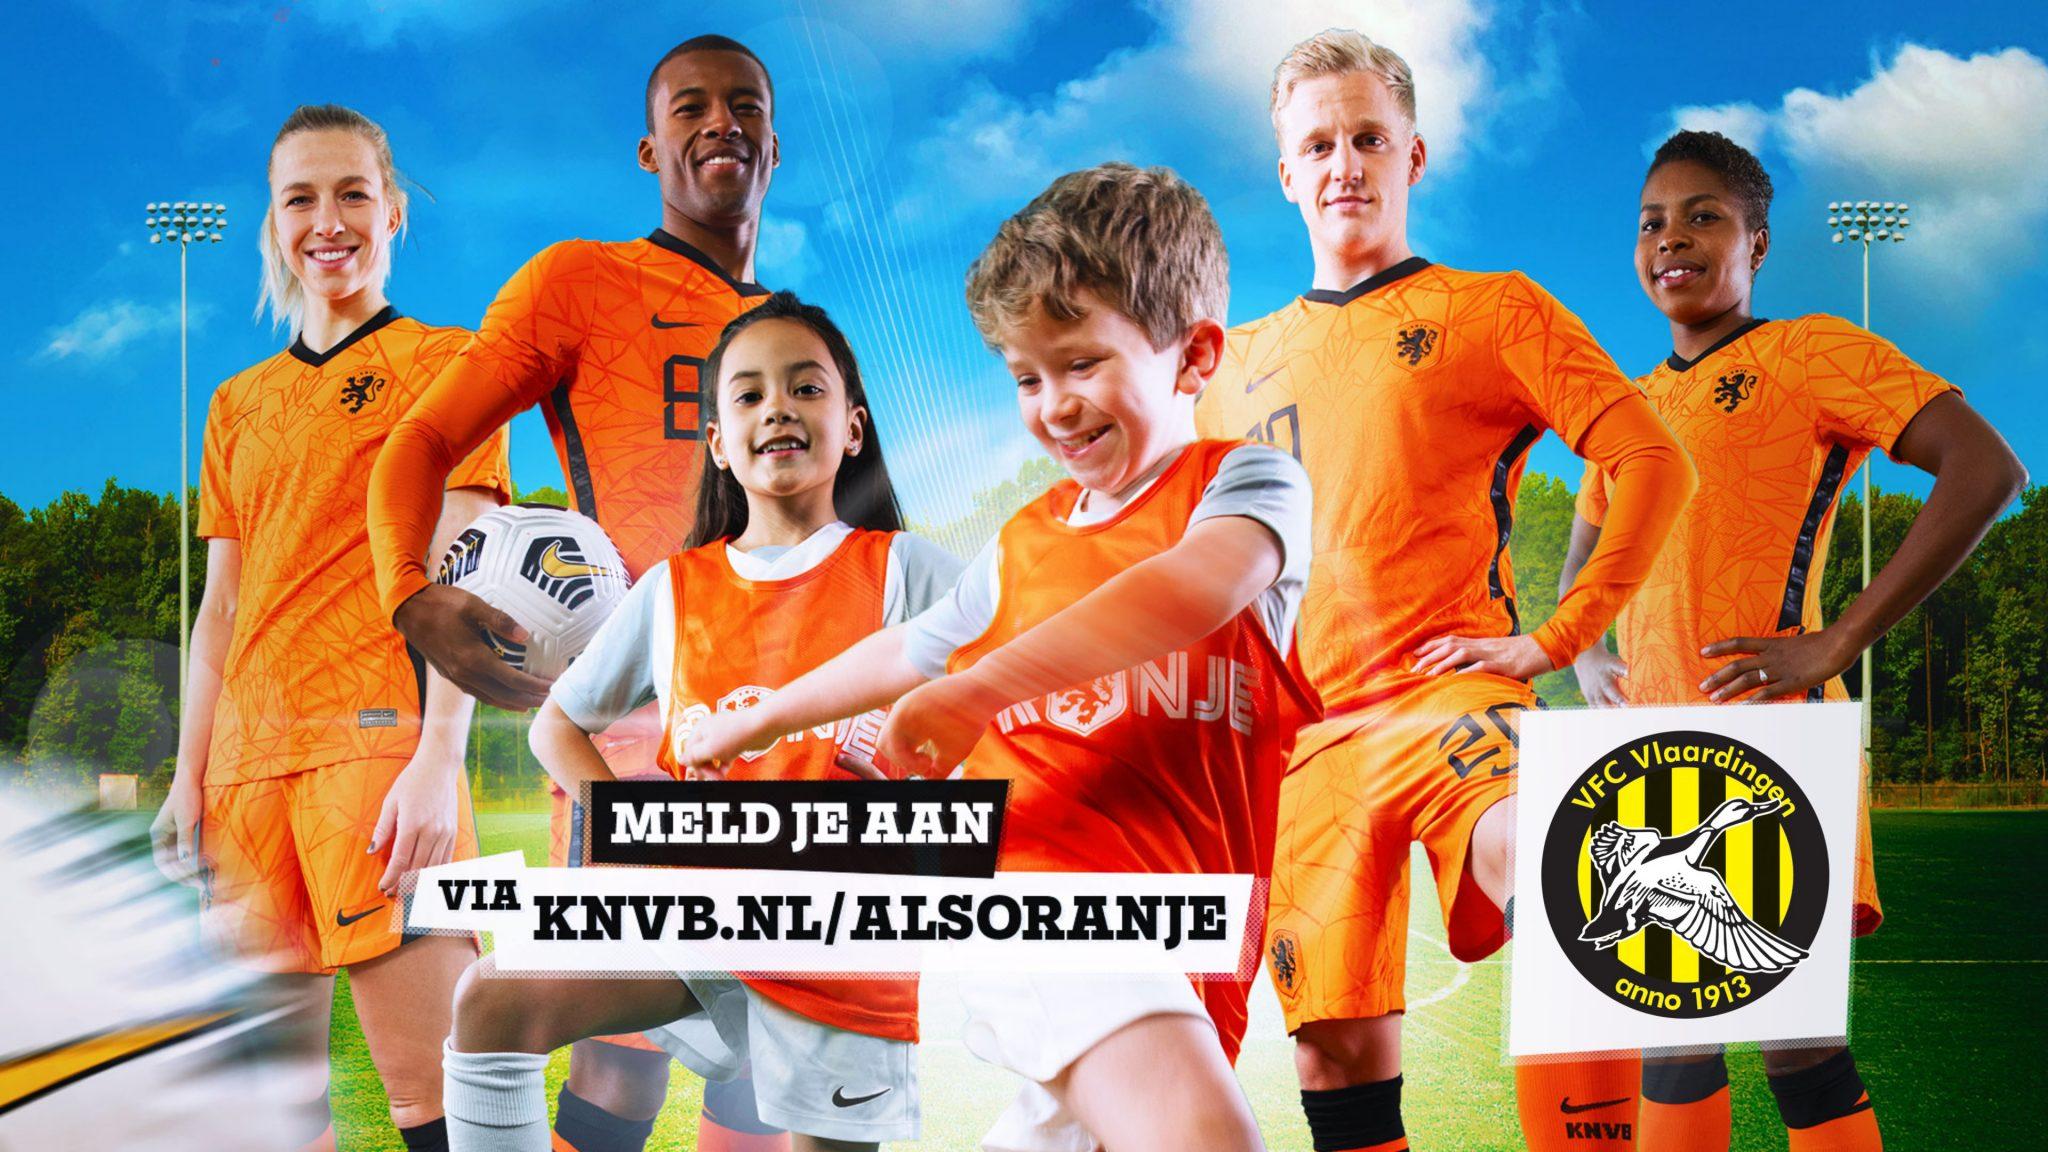 VFC organiseert uniek Oranjefestival op 5 mei!